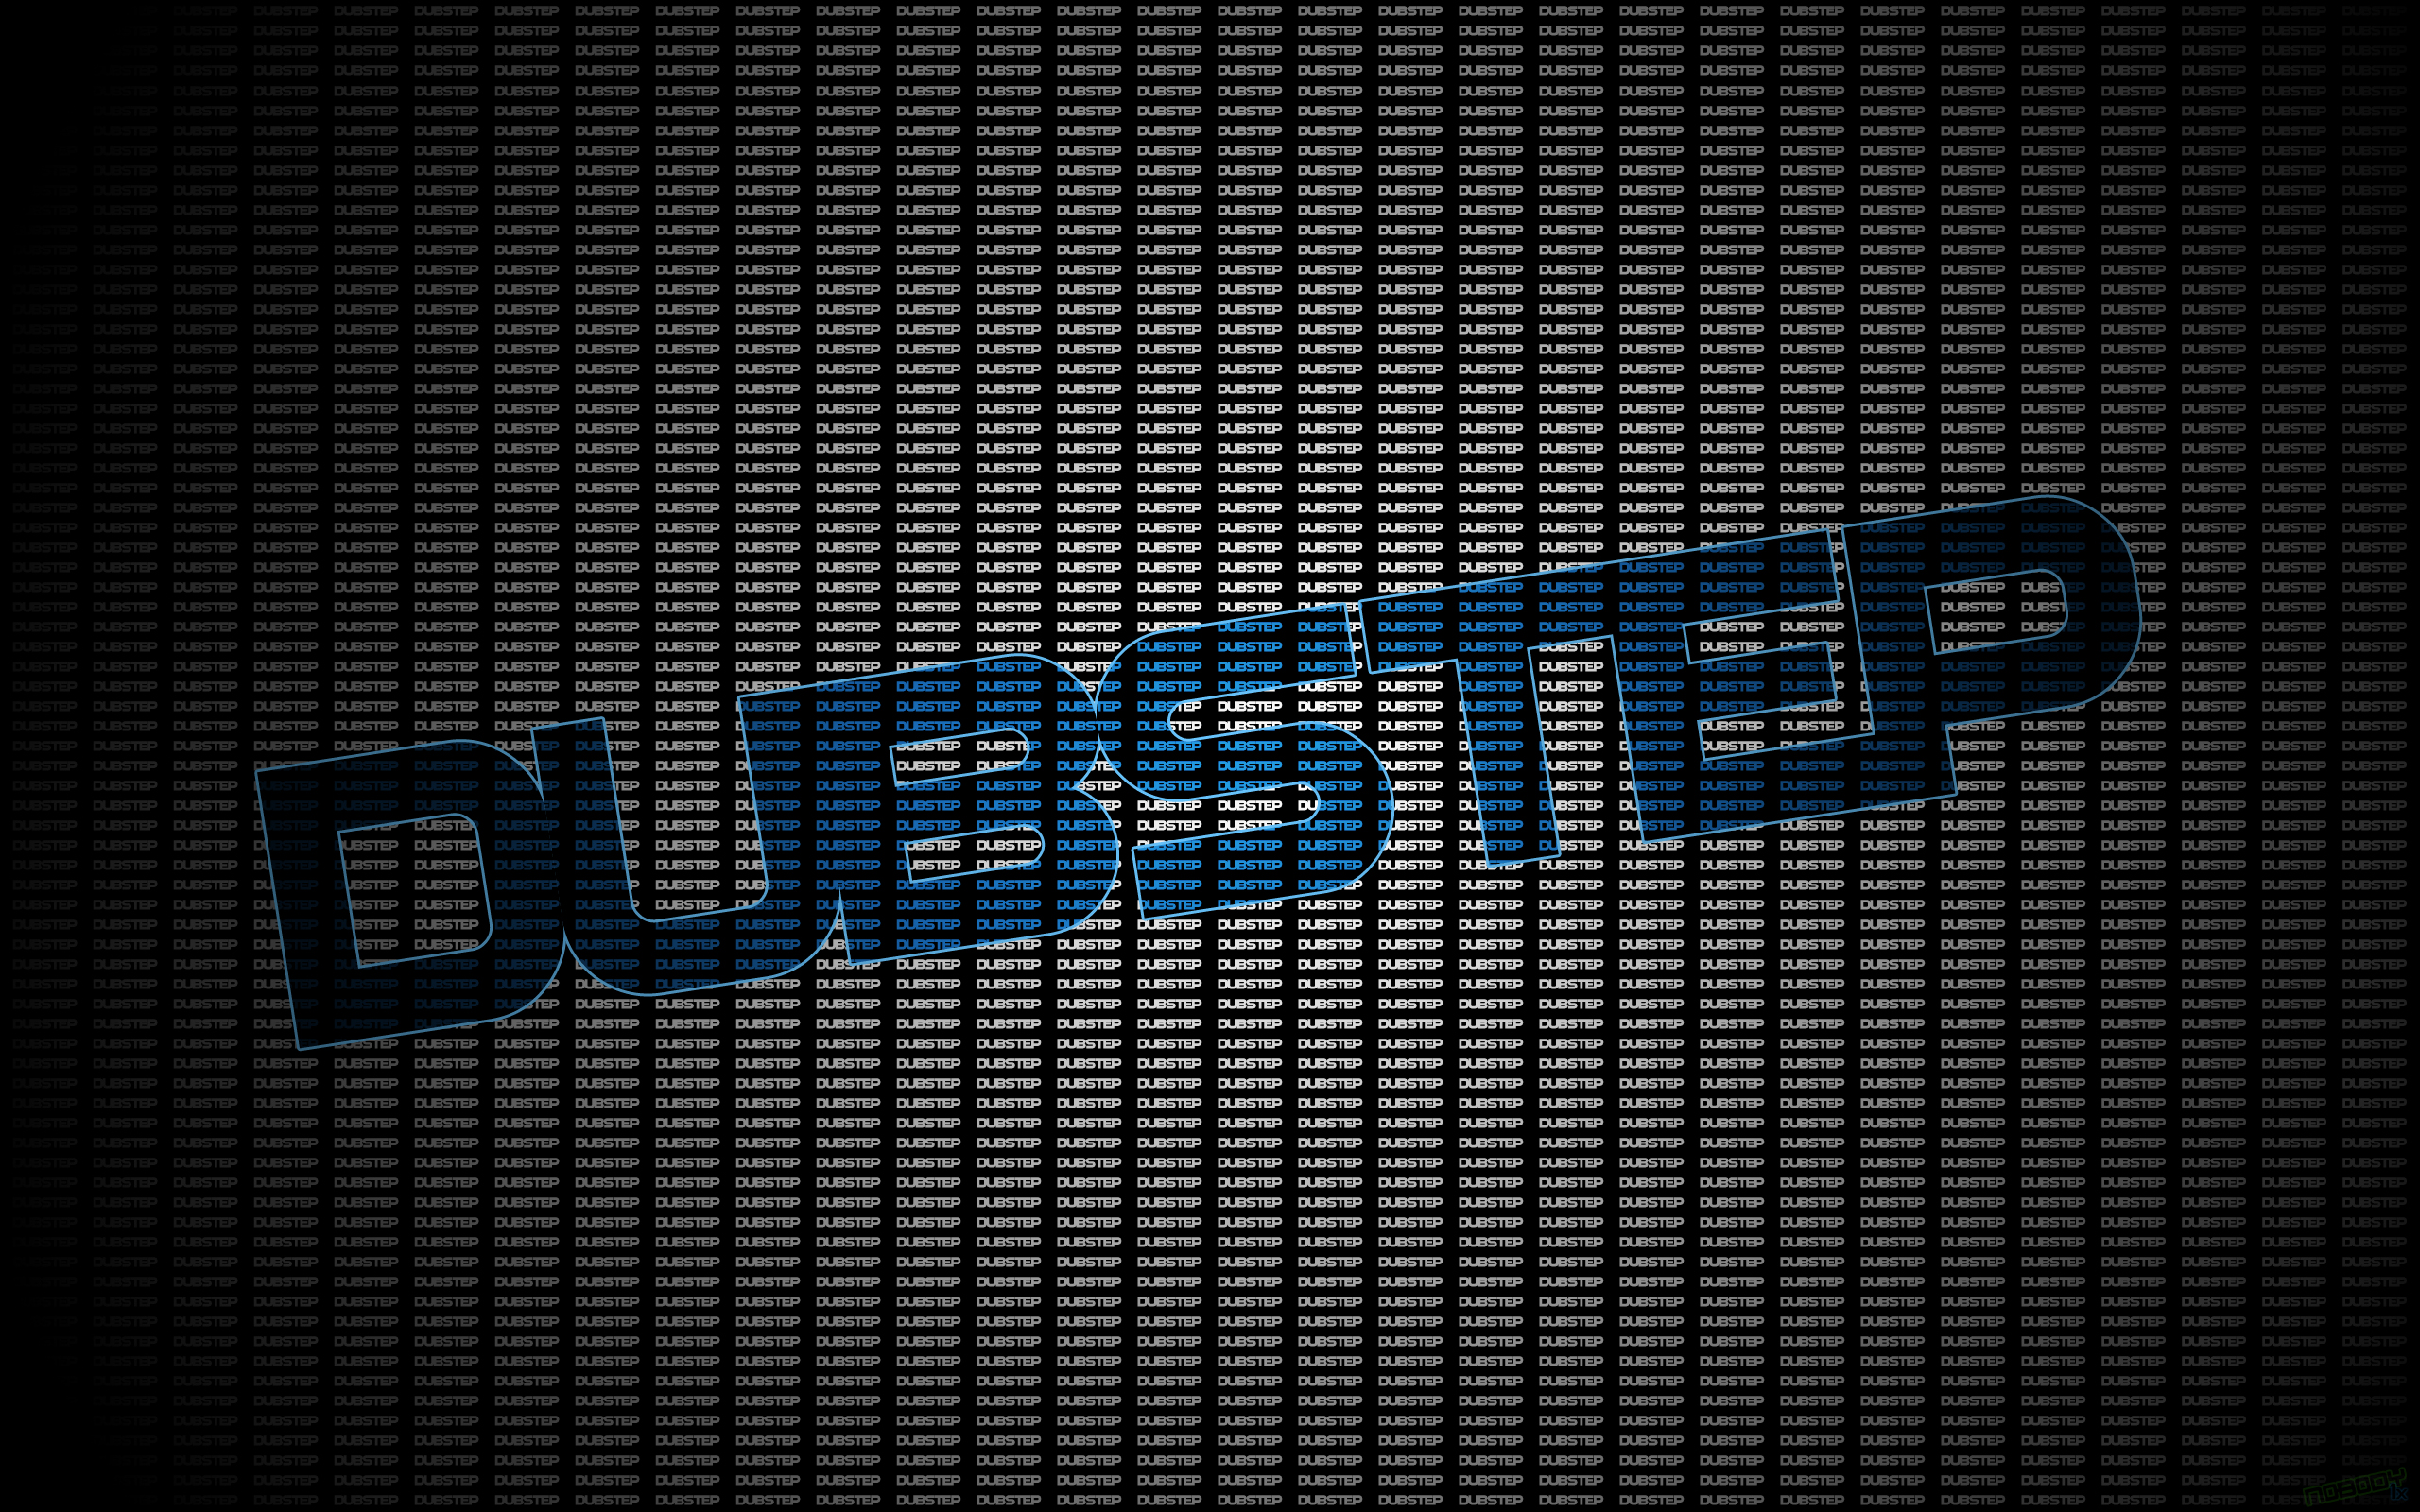 DUBSTEP WallPaper HD by N0B0DY1x on DeviantArt